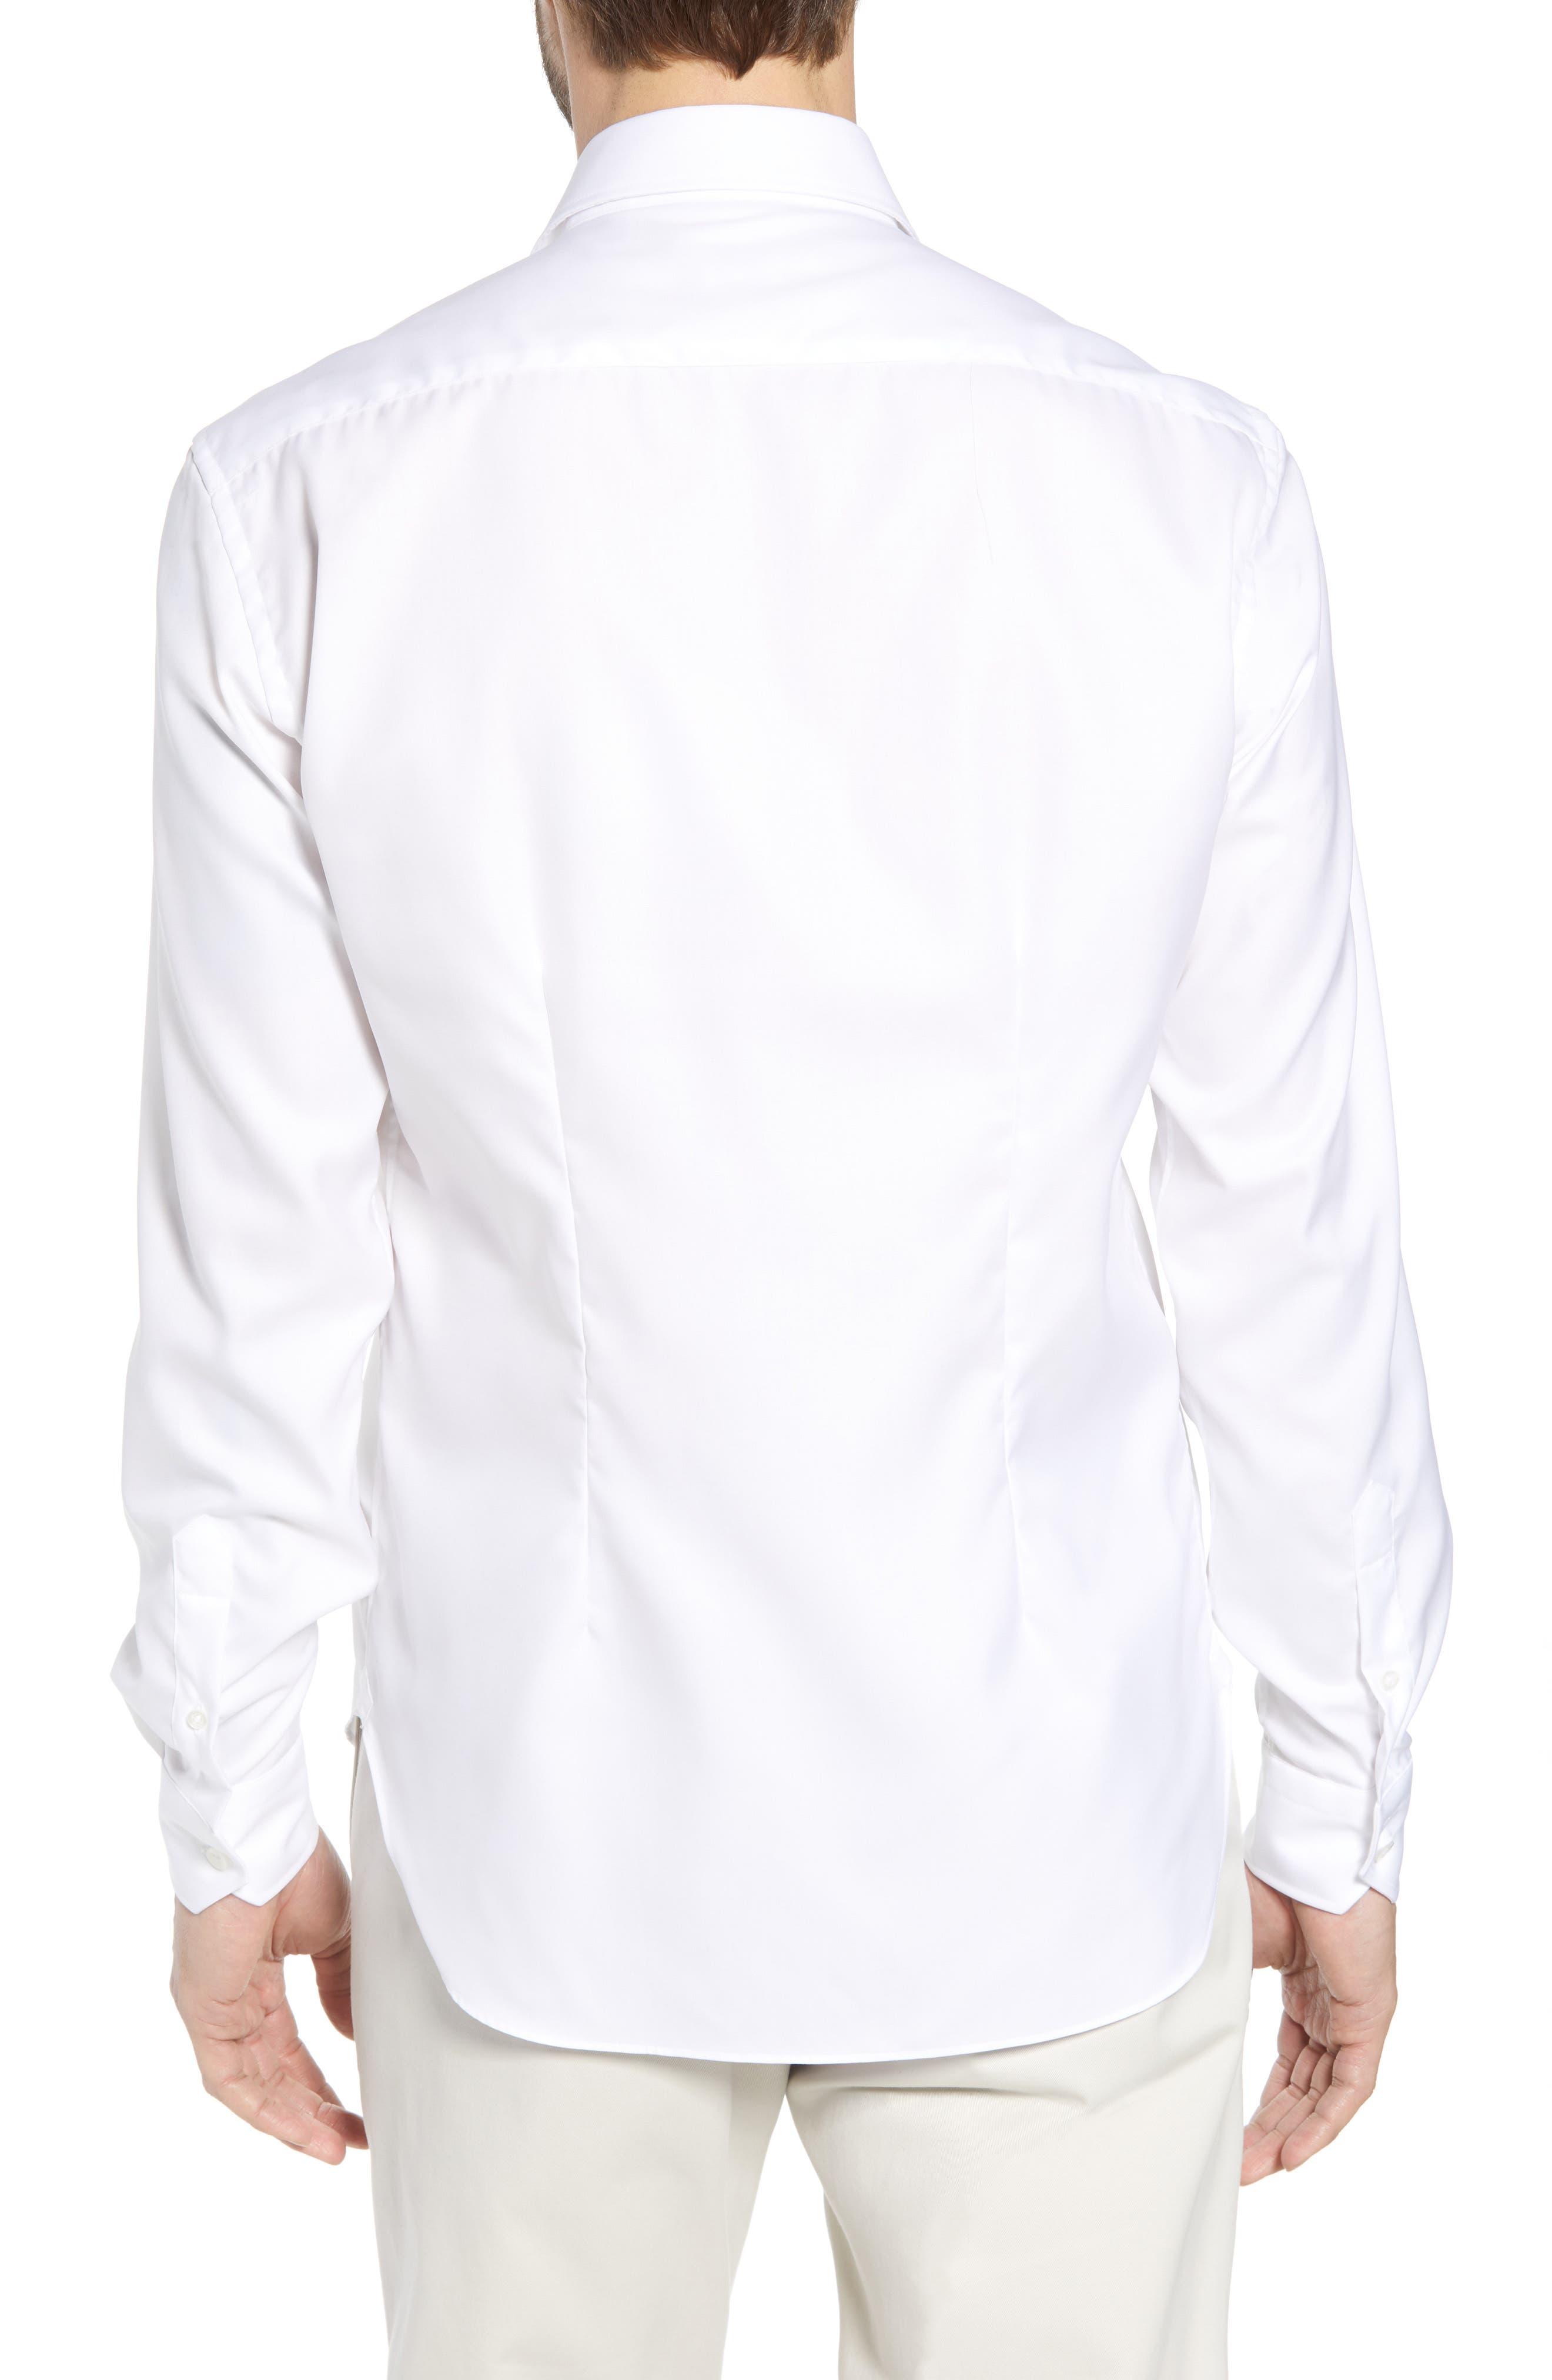 Crease Free Extra Soft Sport Shirt,                             Alternate thumbnail 2, color,                             100